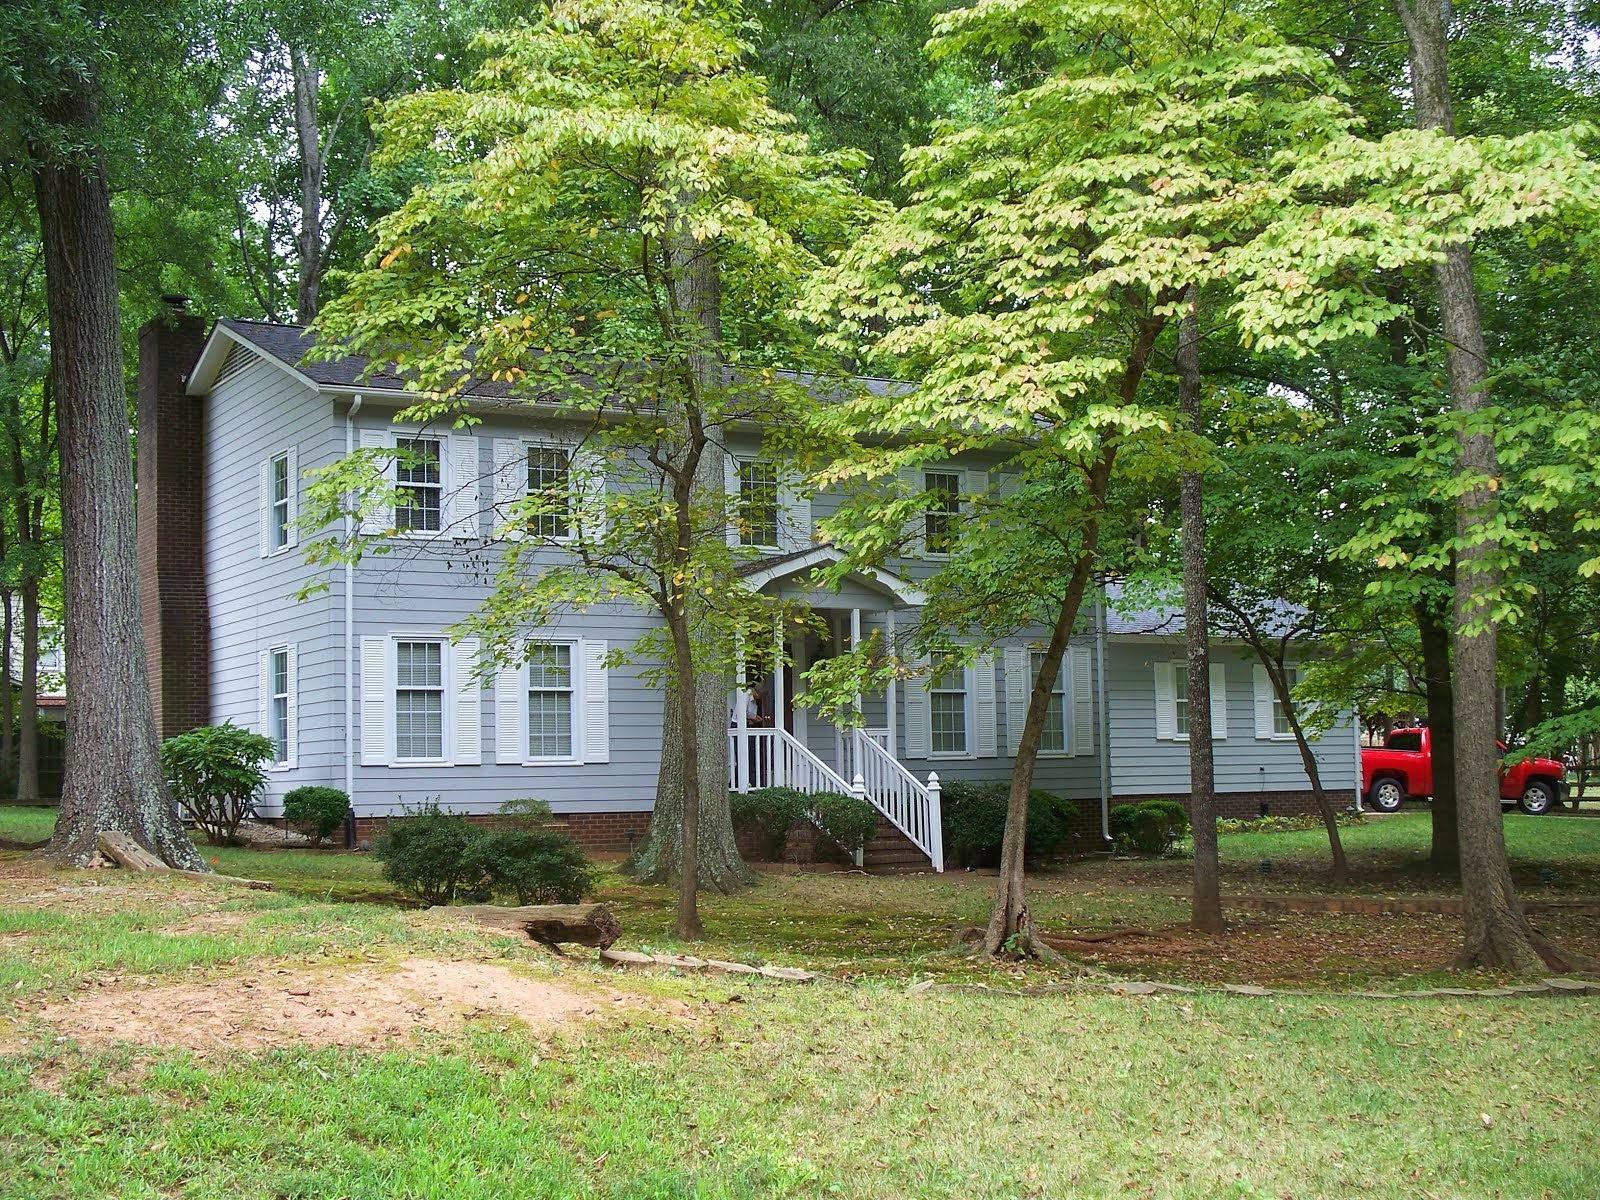 108 Canteberry Drive, Salisbury NC, 28144 ~ $200,000